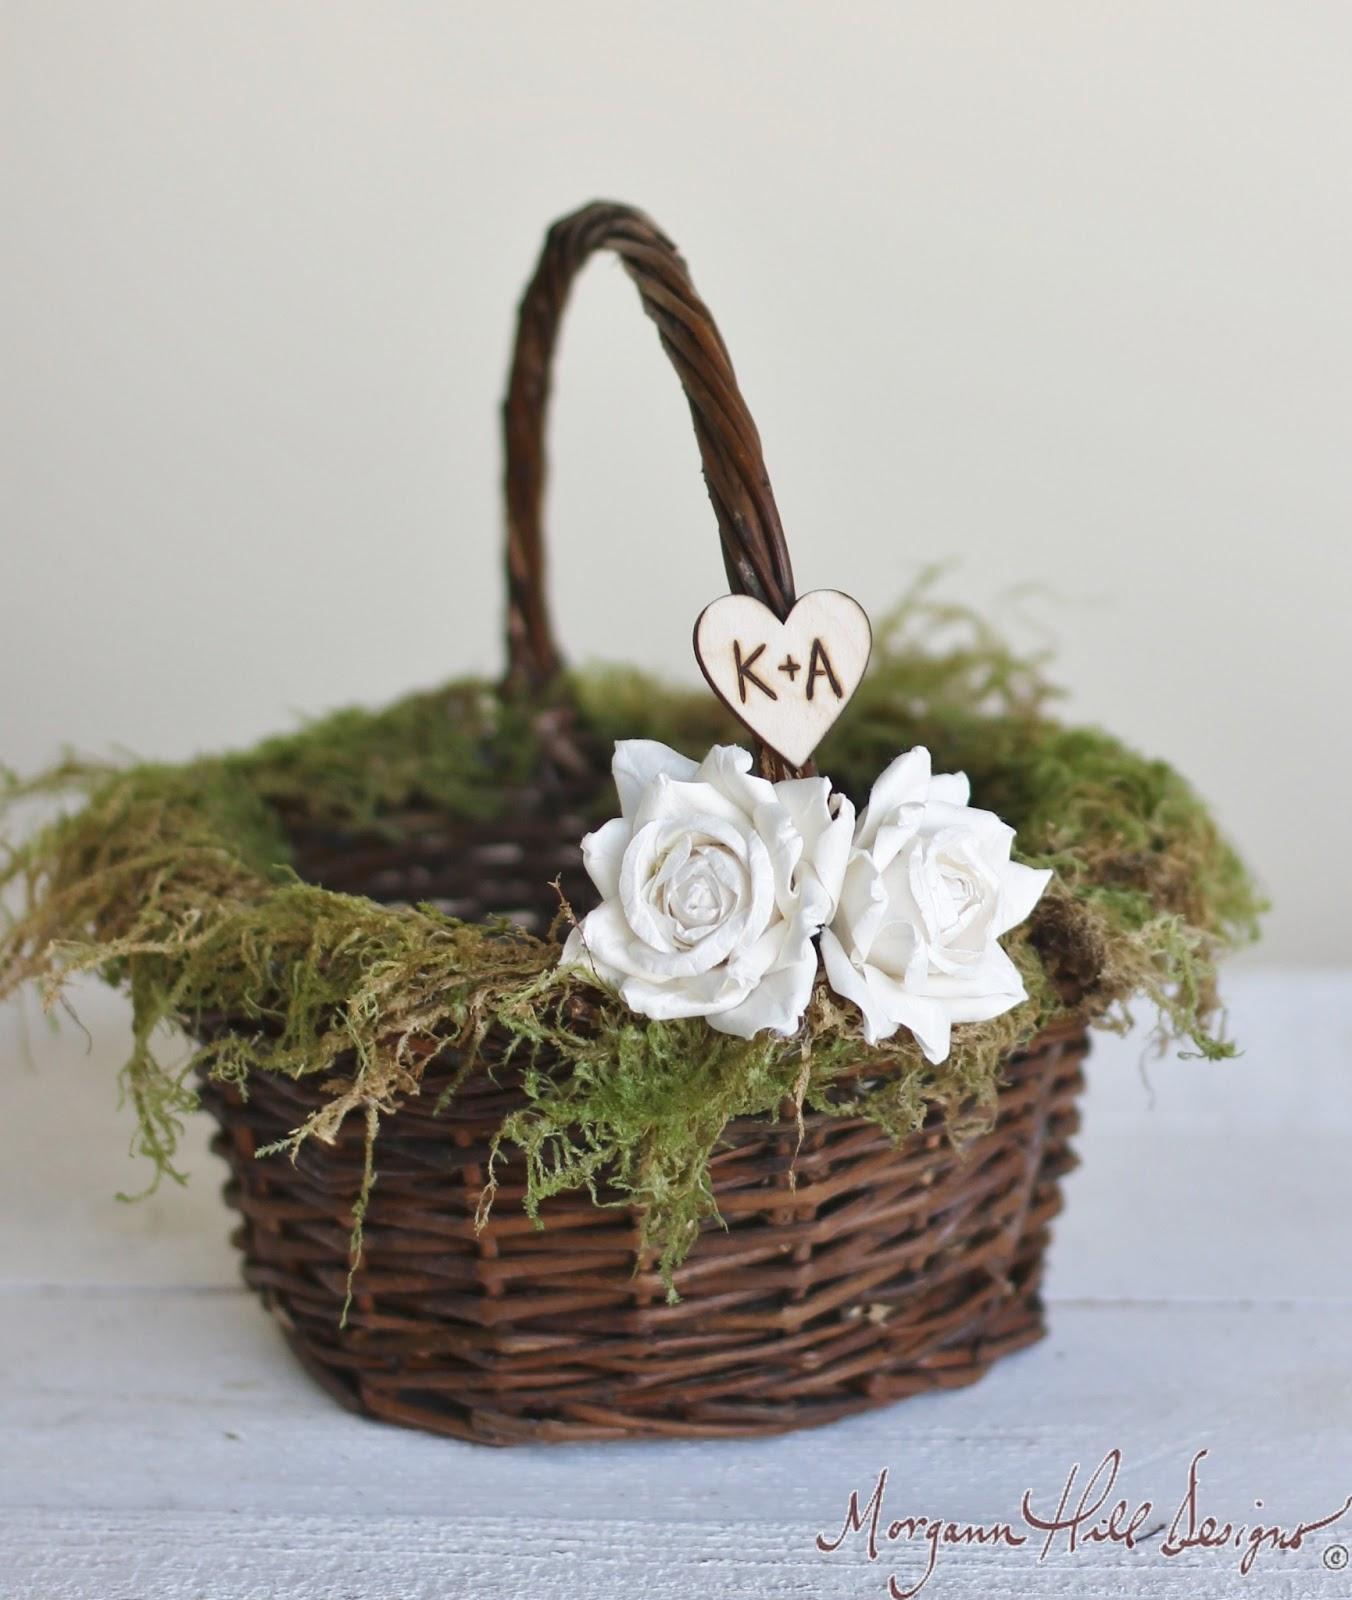 Flower Girl Basket Moss : Morgann hill designs personalized flower girl basket